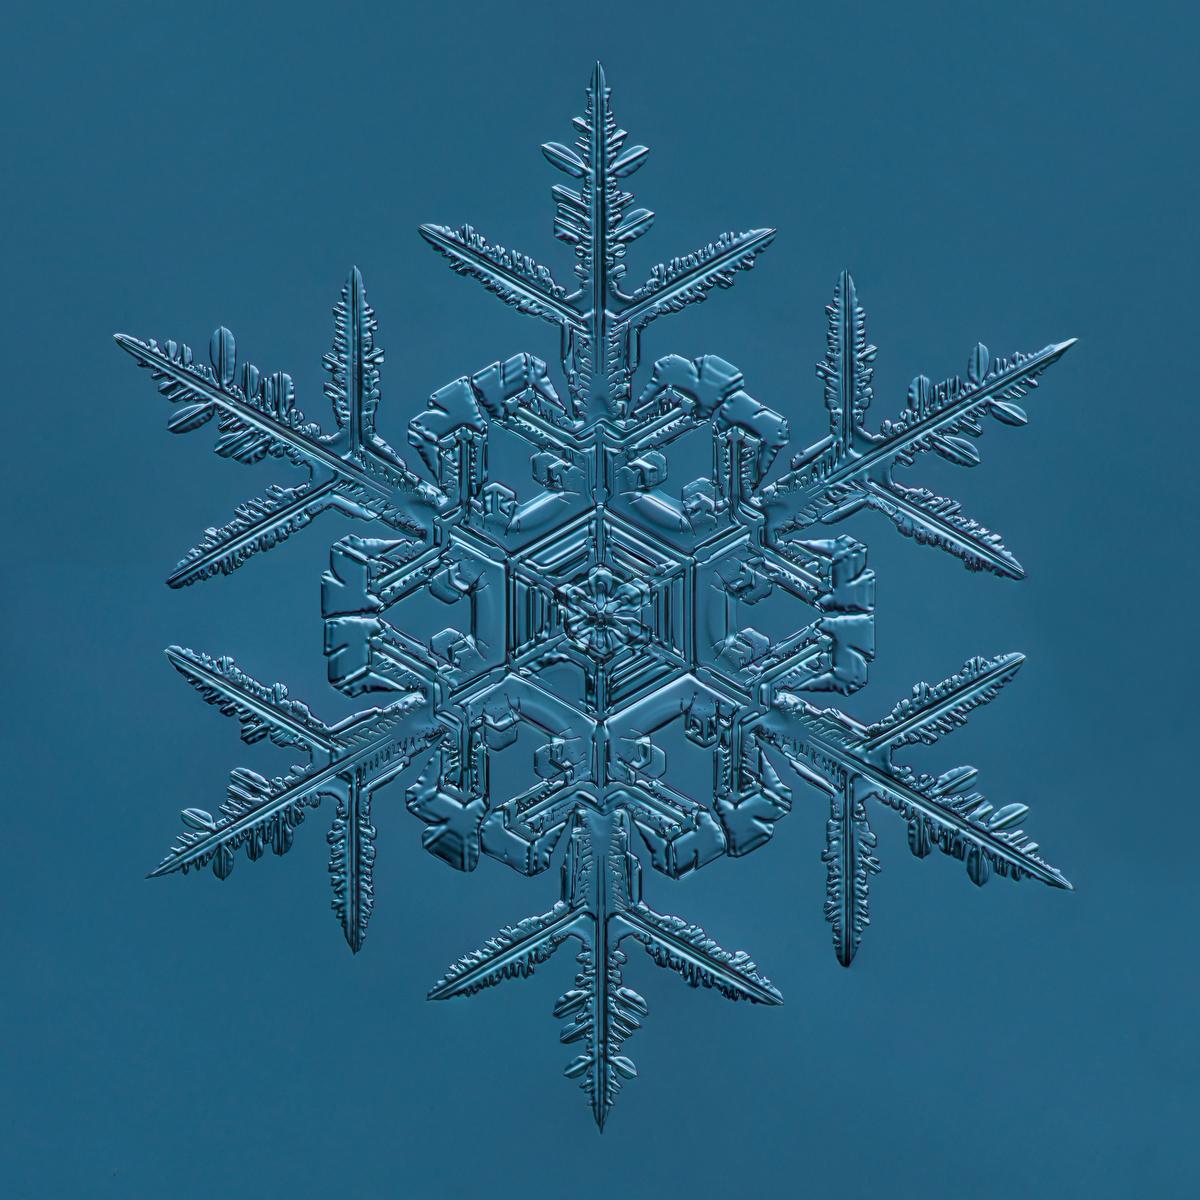 Snowflake 2015.02.02.008